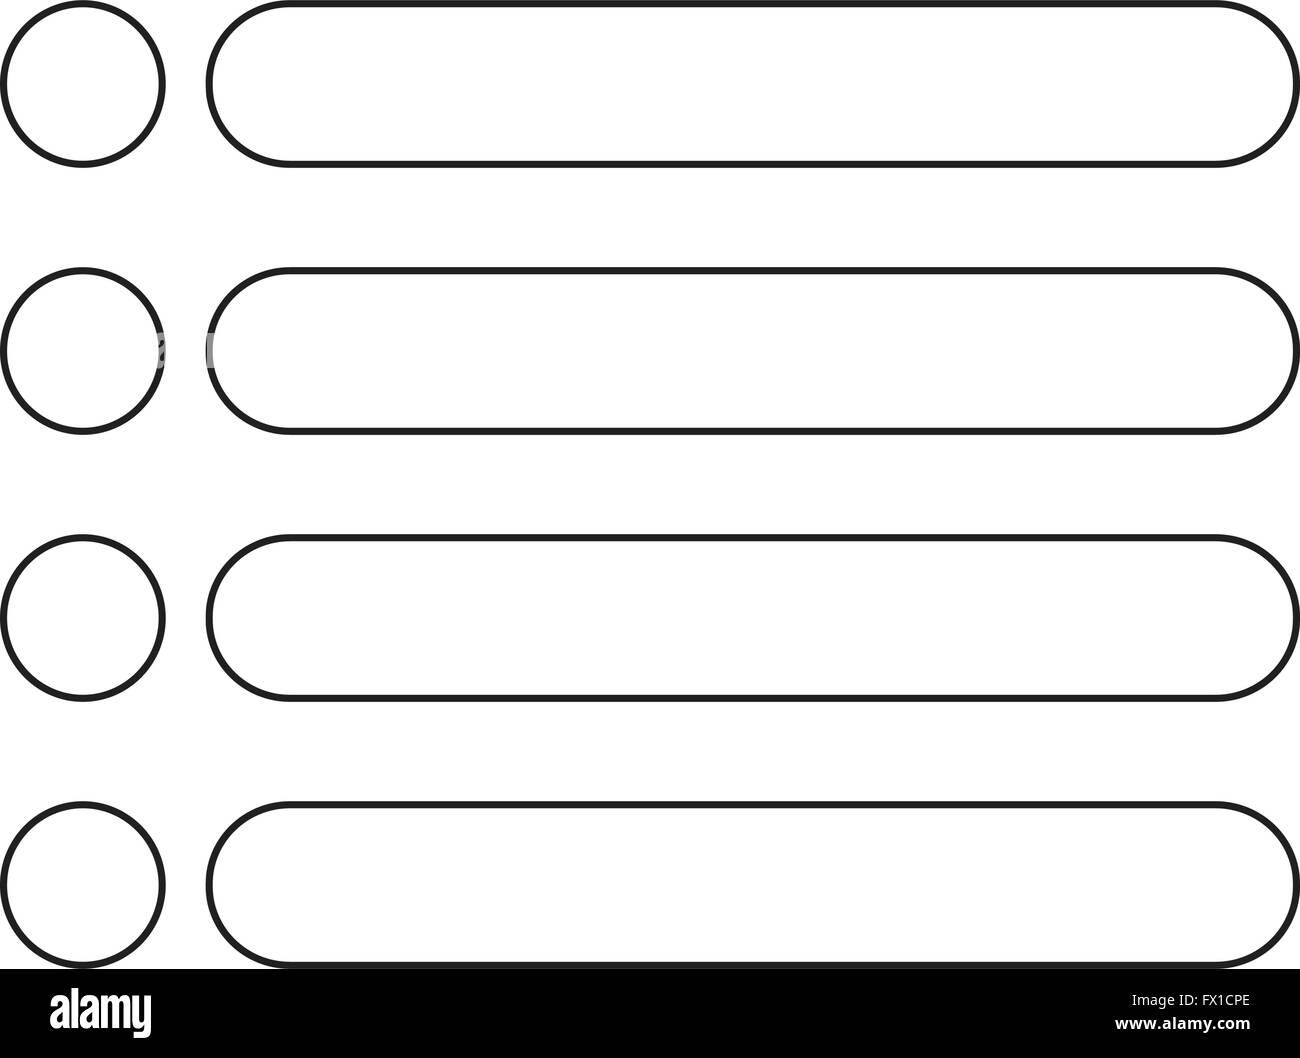 bulleted list icon sign stock vector art illustration vector